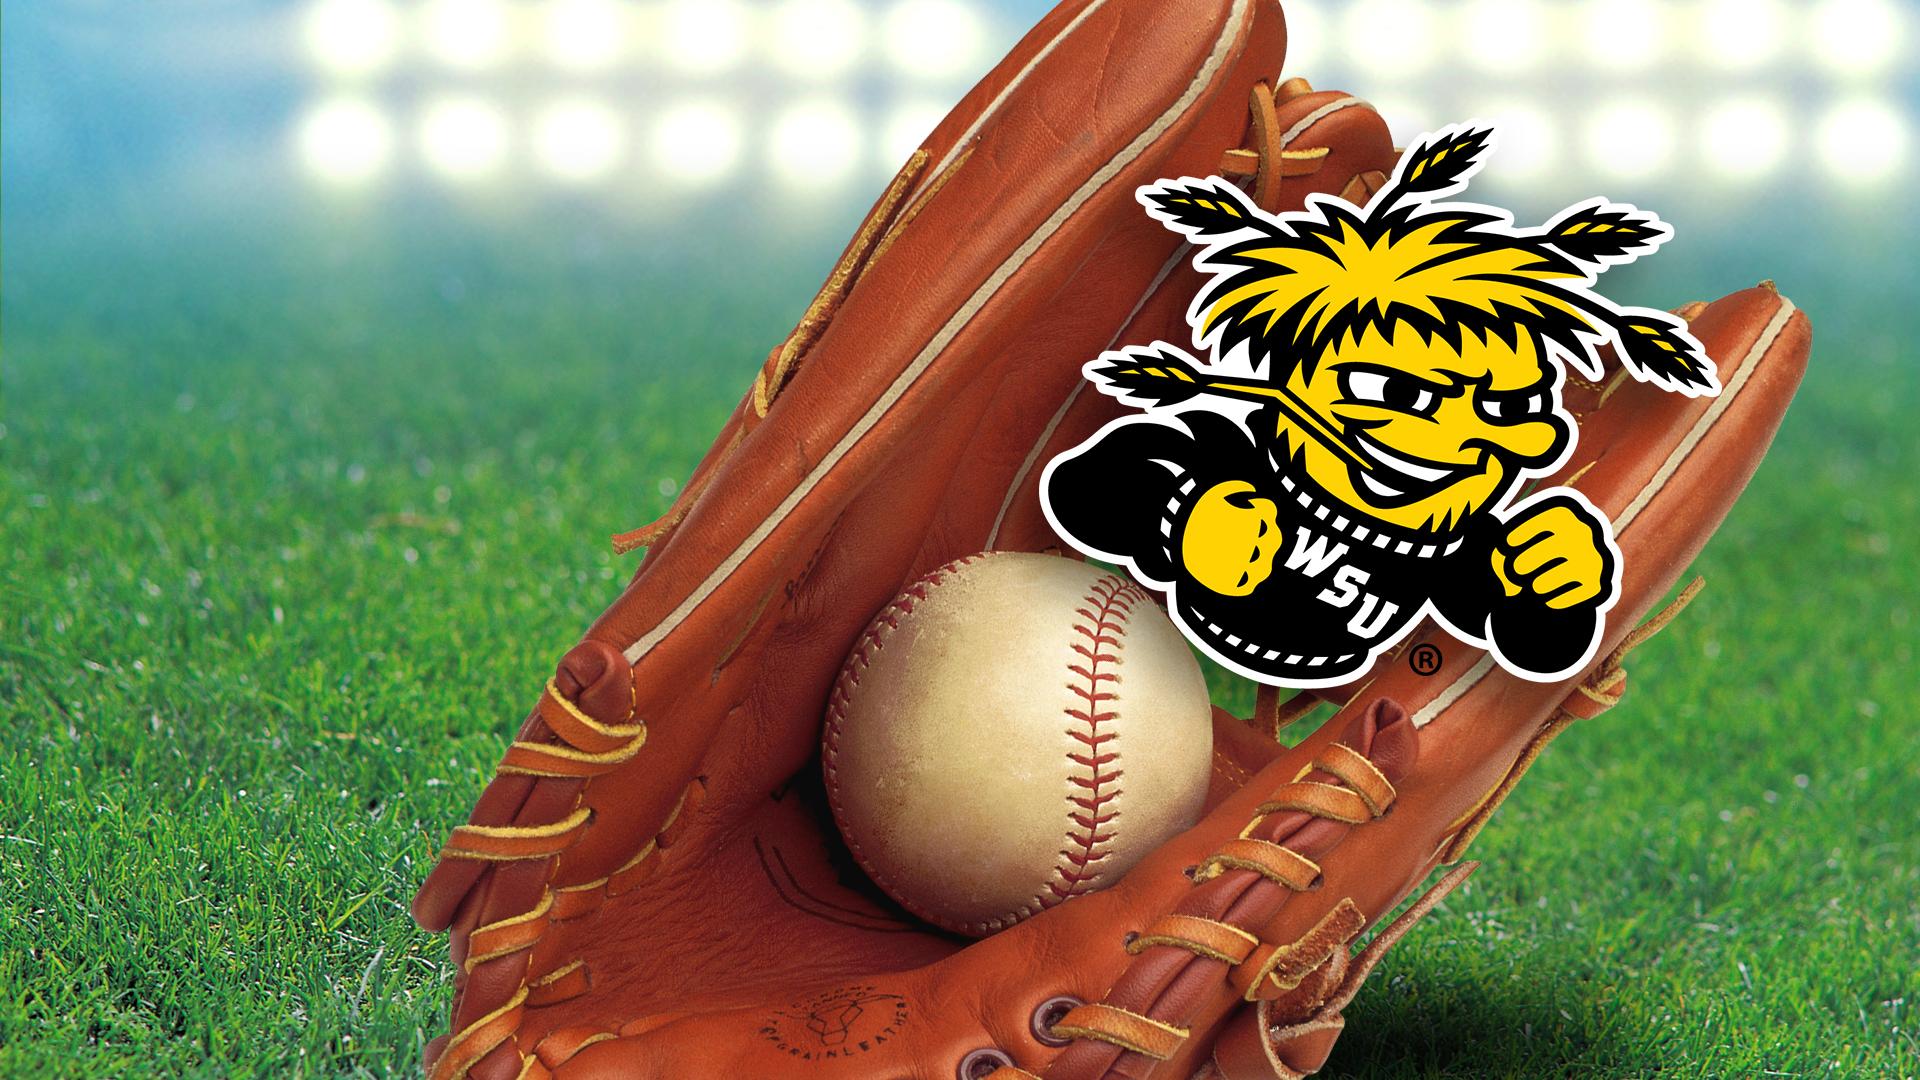 WSU Baseball